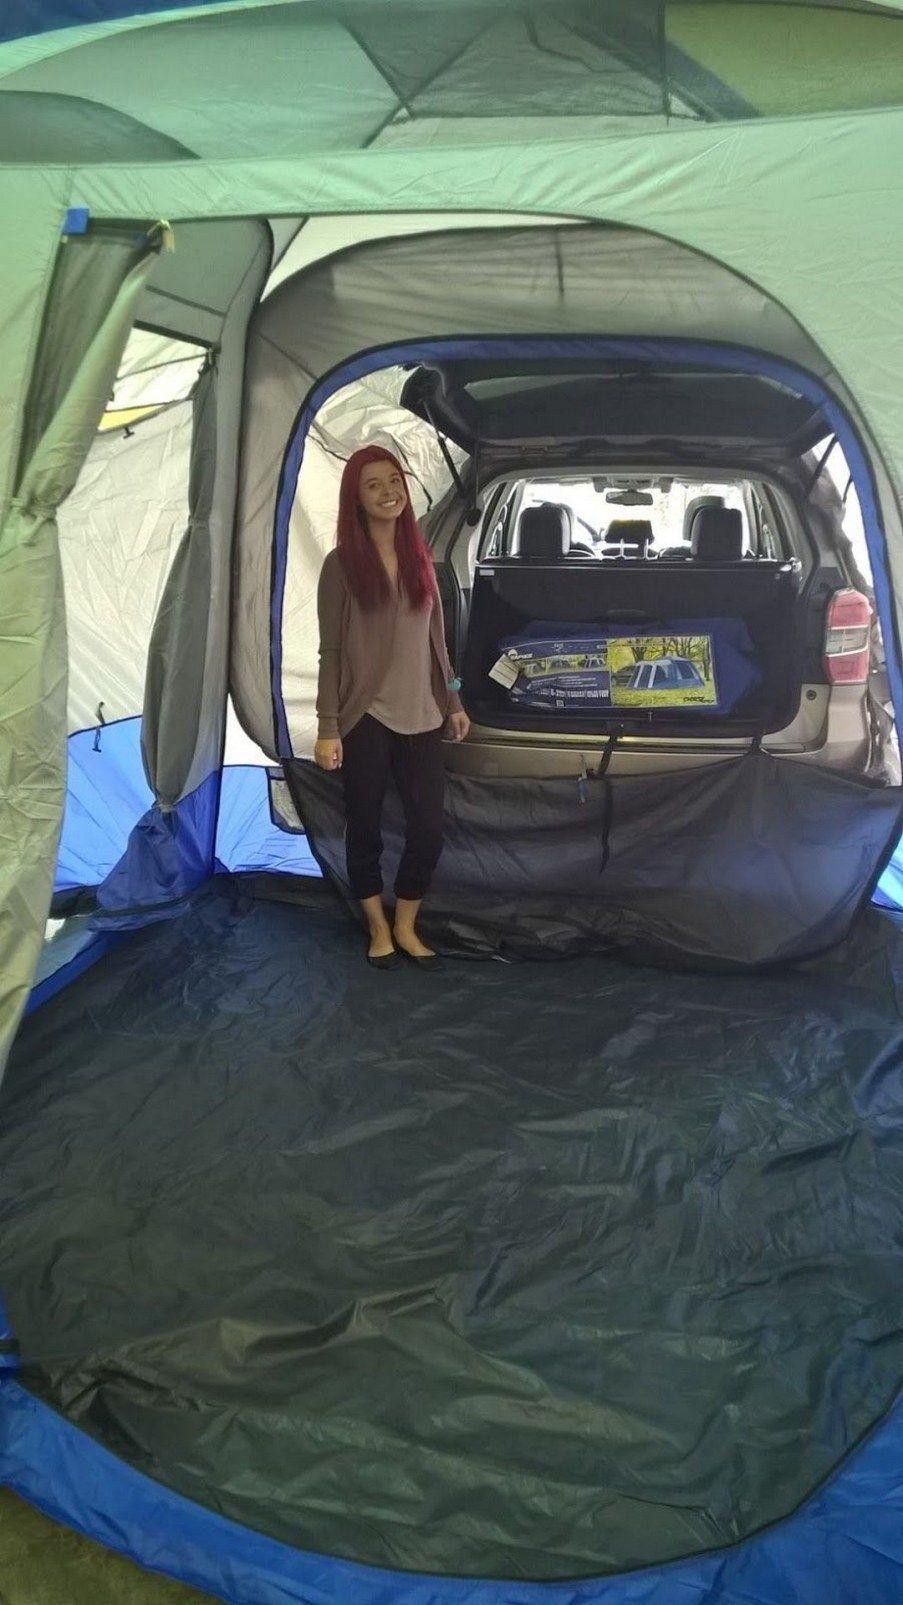 Genius Outdoor Bonnaroo Camping Hacks (3) – Vanchitecture -  Camping Hacks Additionally, a poncho